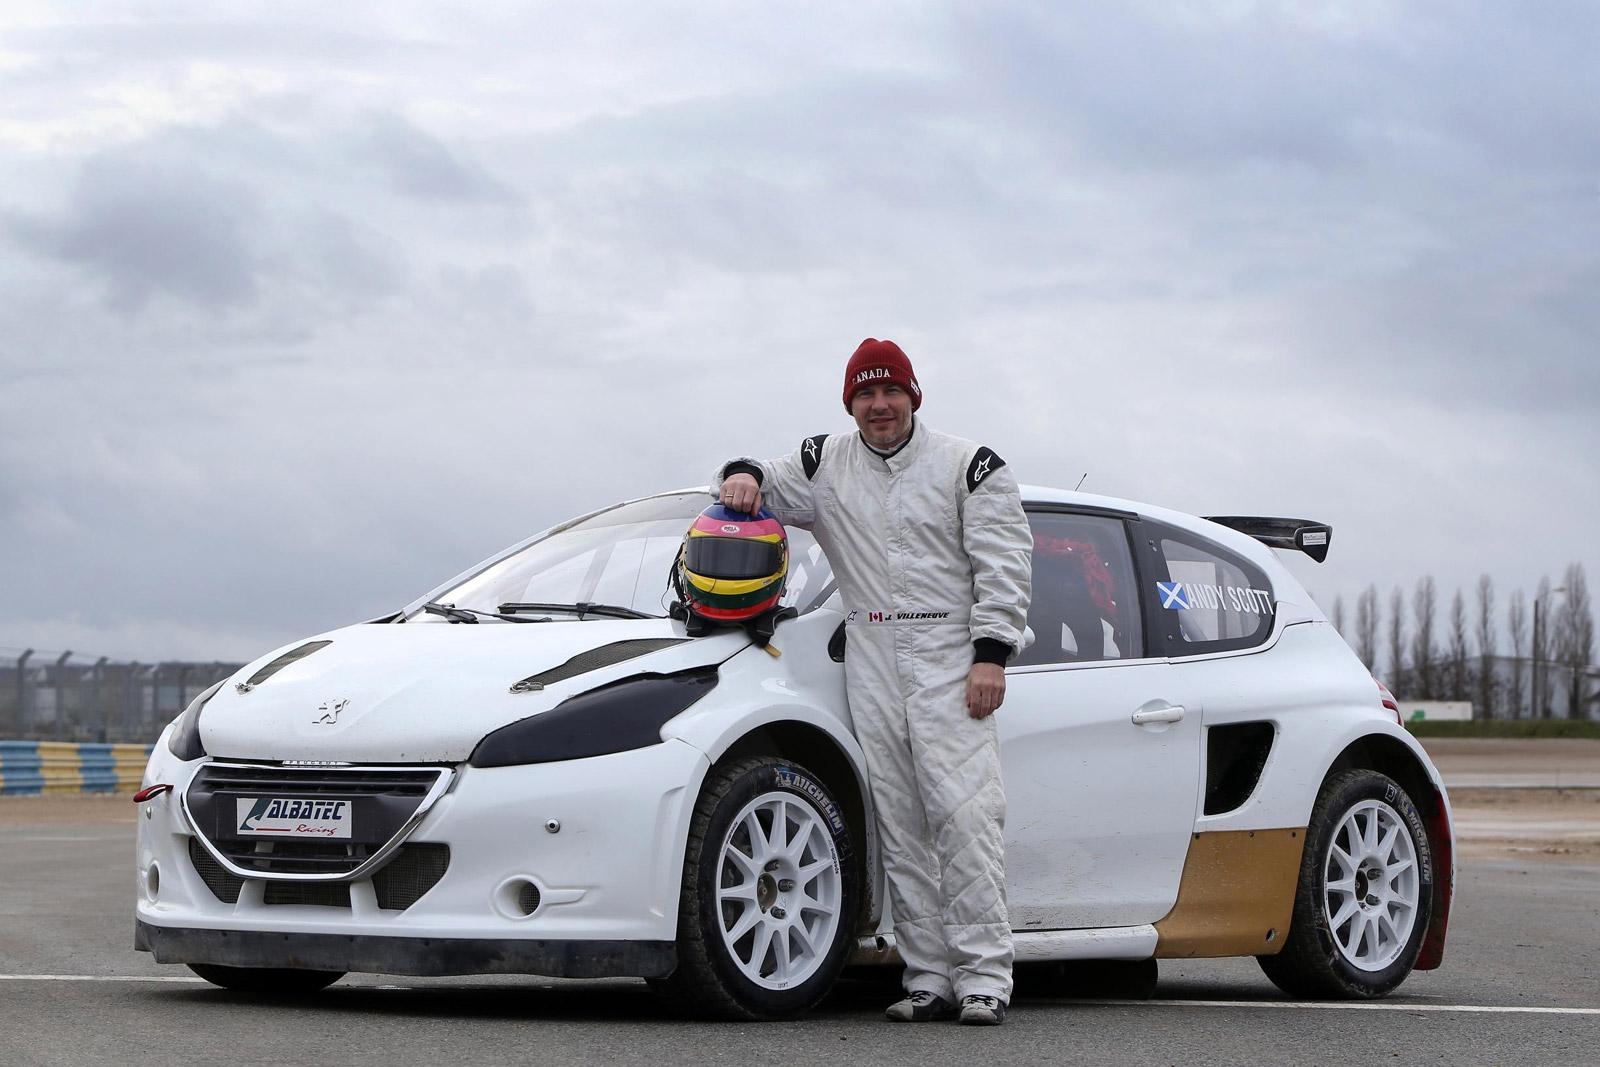 Former F1 Champ Jacques Villeneuve Joins World Rallycross Championship